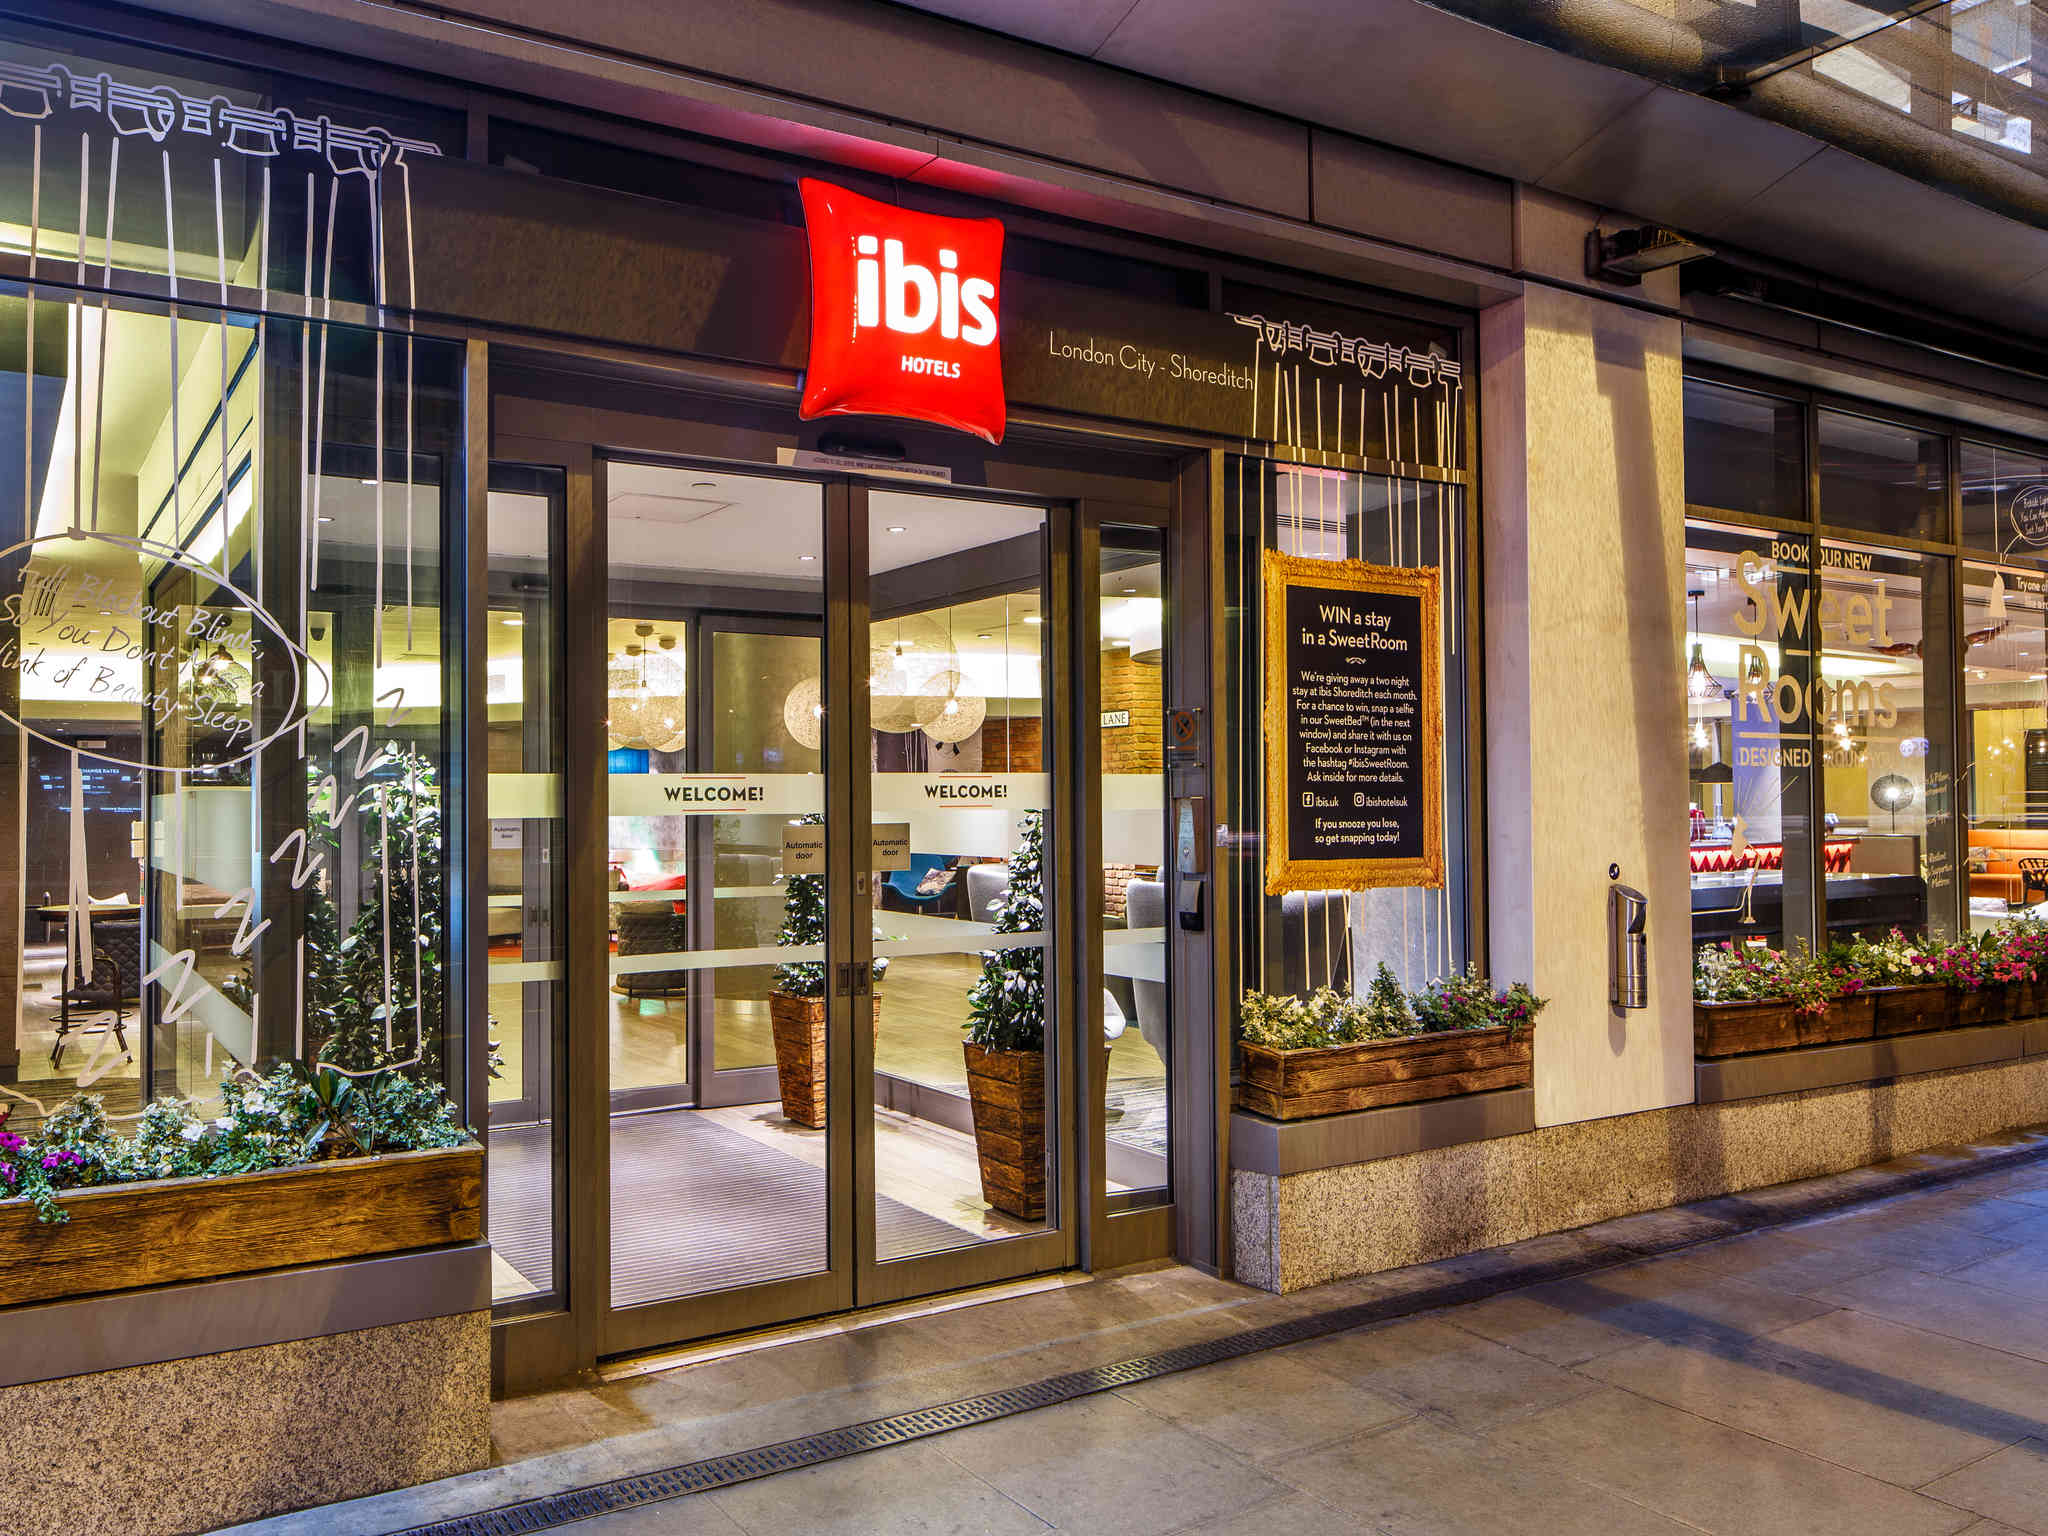 Ibis shoreditch cheap london city hotel